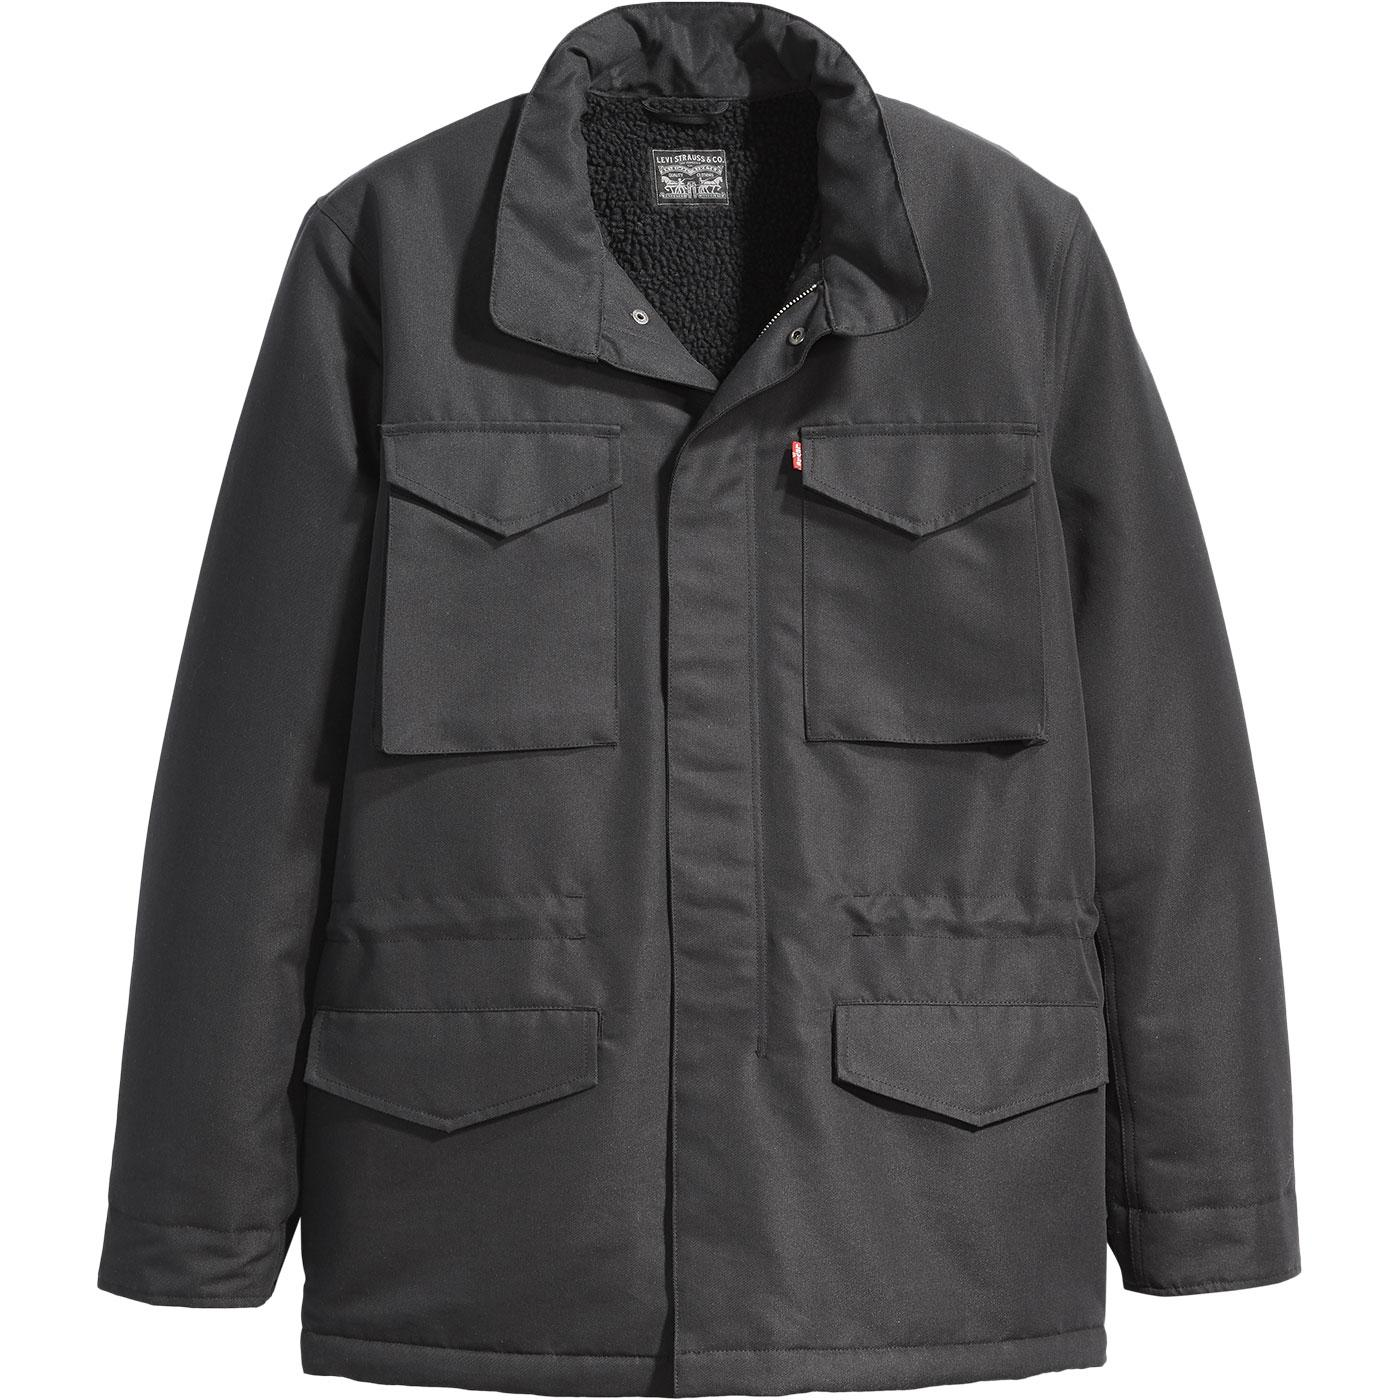 LEVI'S Men's Retro Military Sherpa Field Jacket